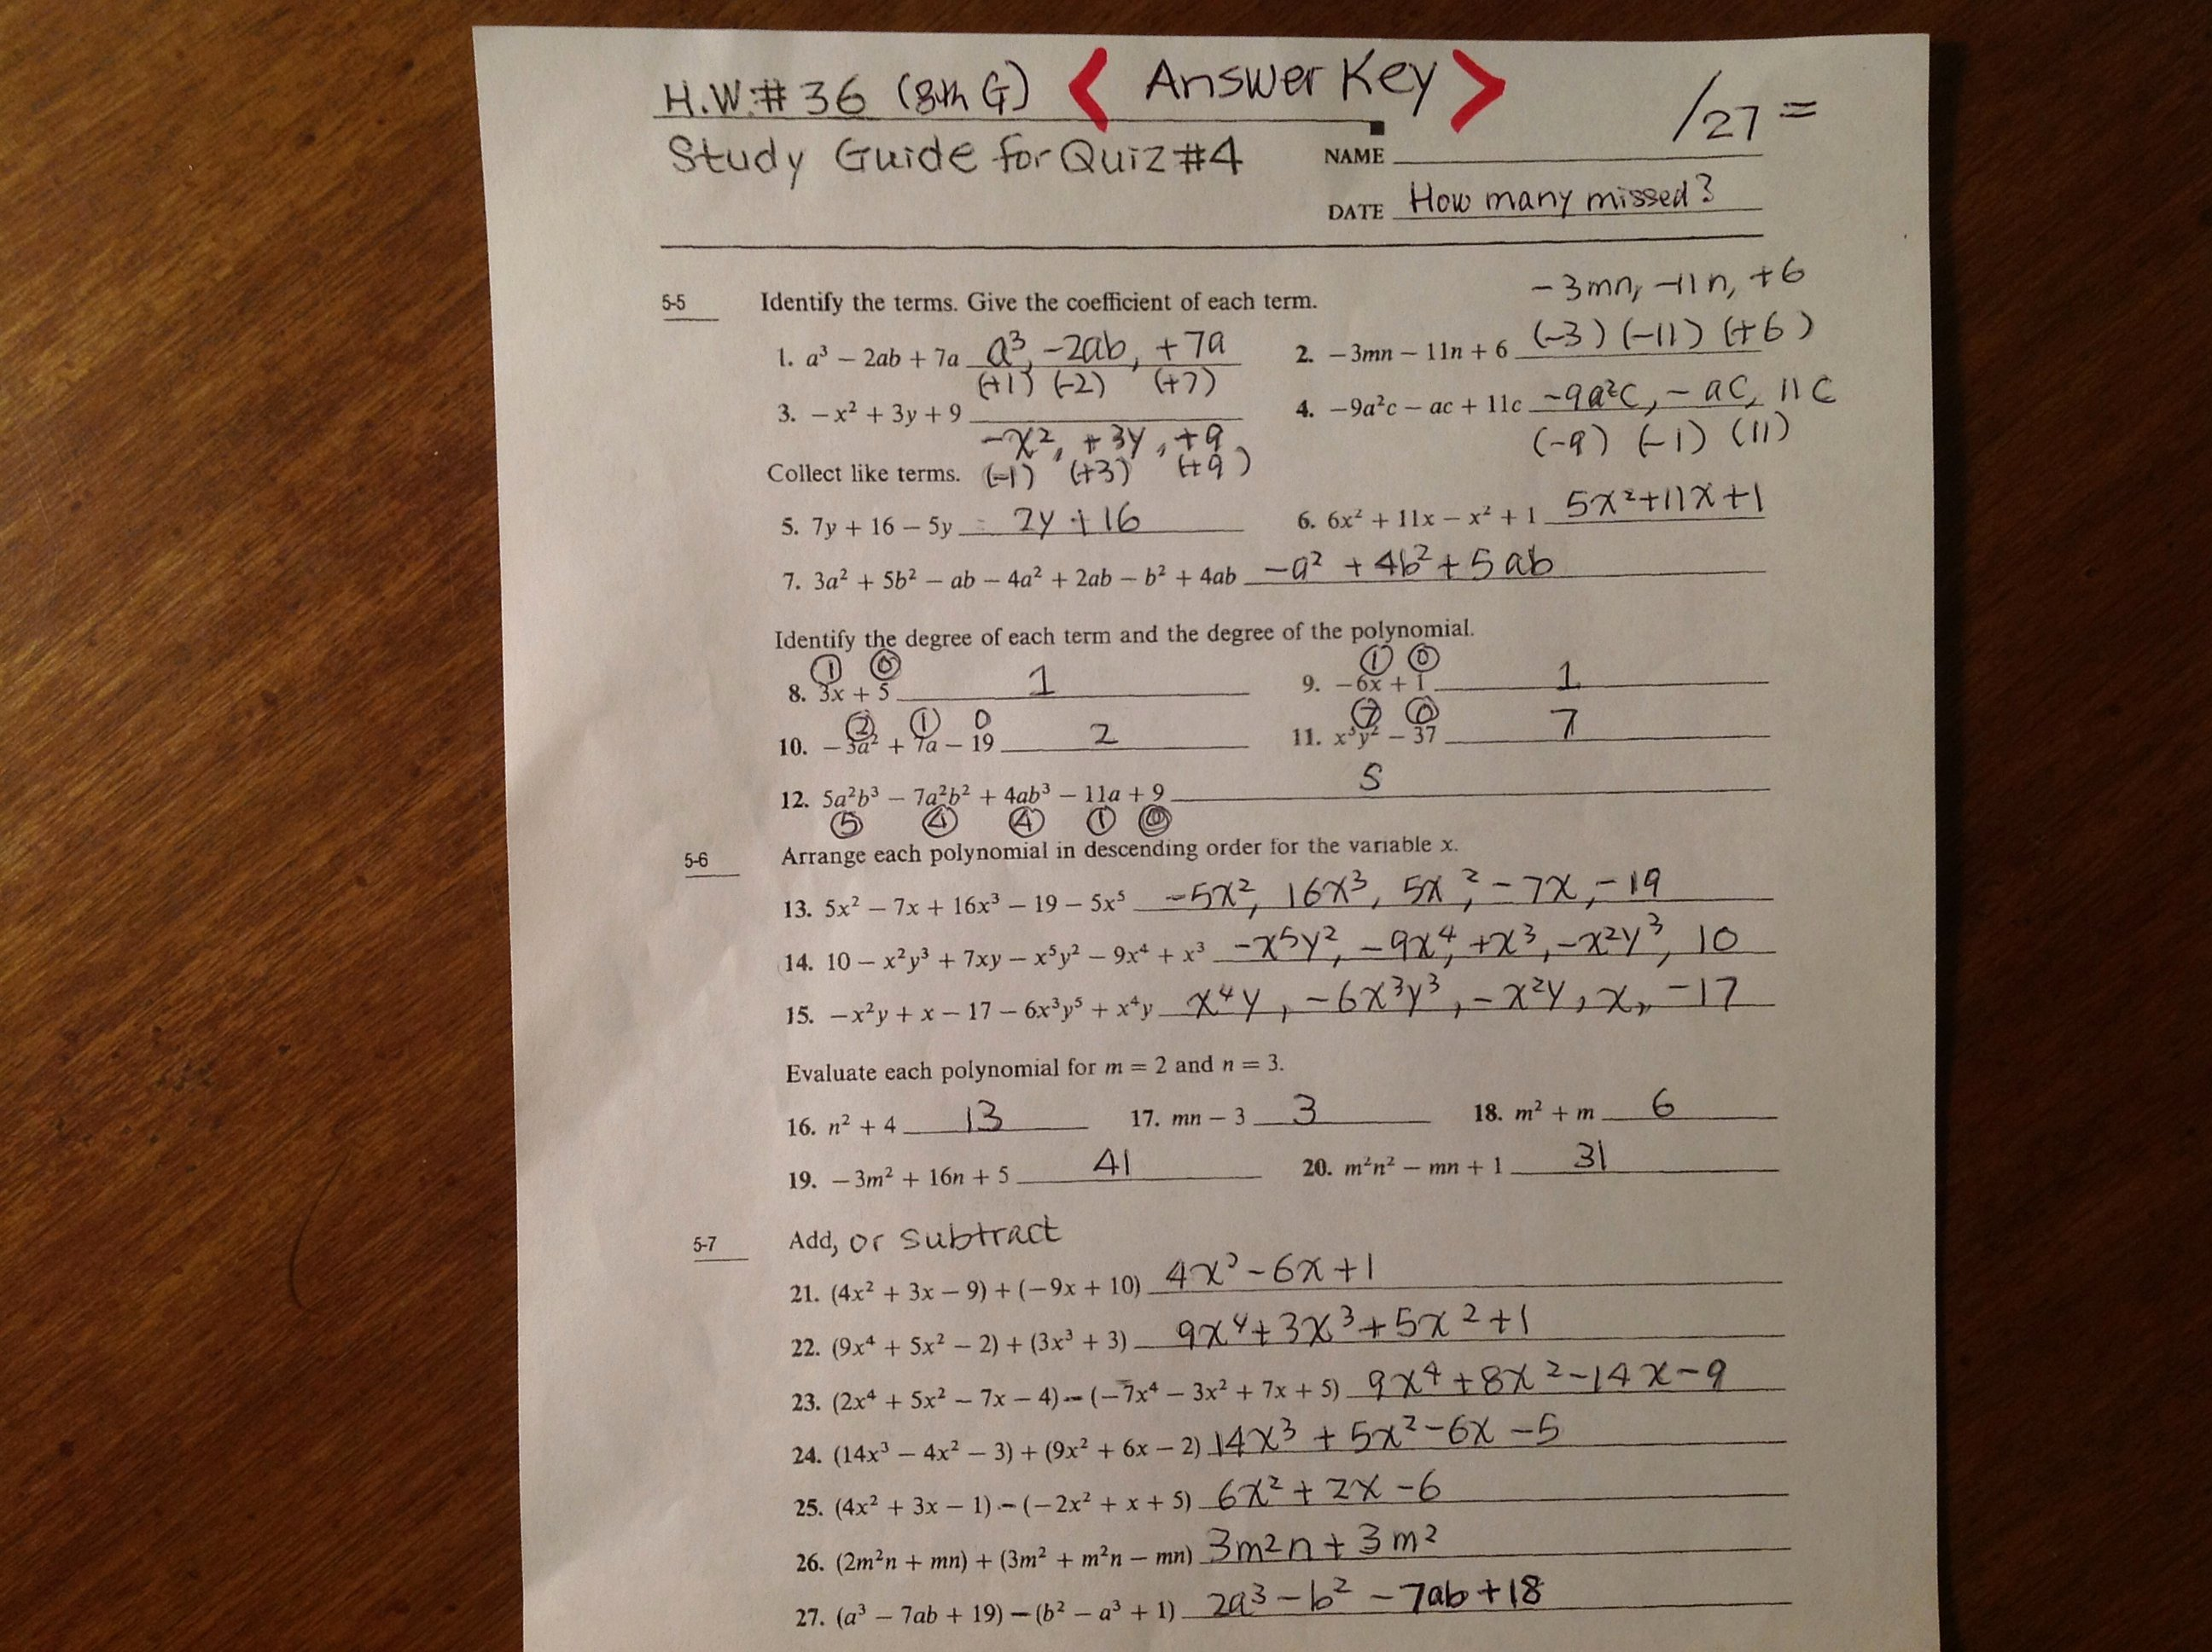 6.3 Biodiversity Worksheet Answers Elegant Mrs sorensen Math today S Lesson